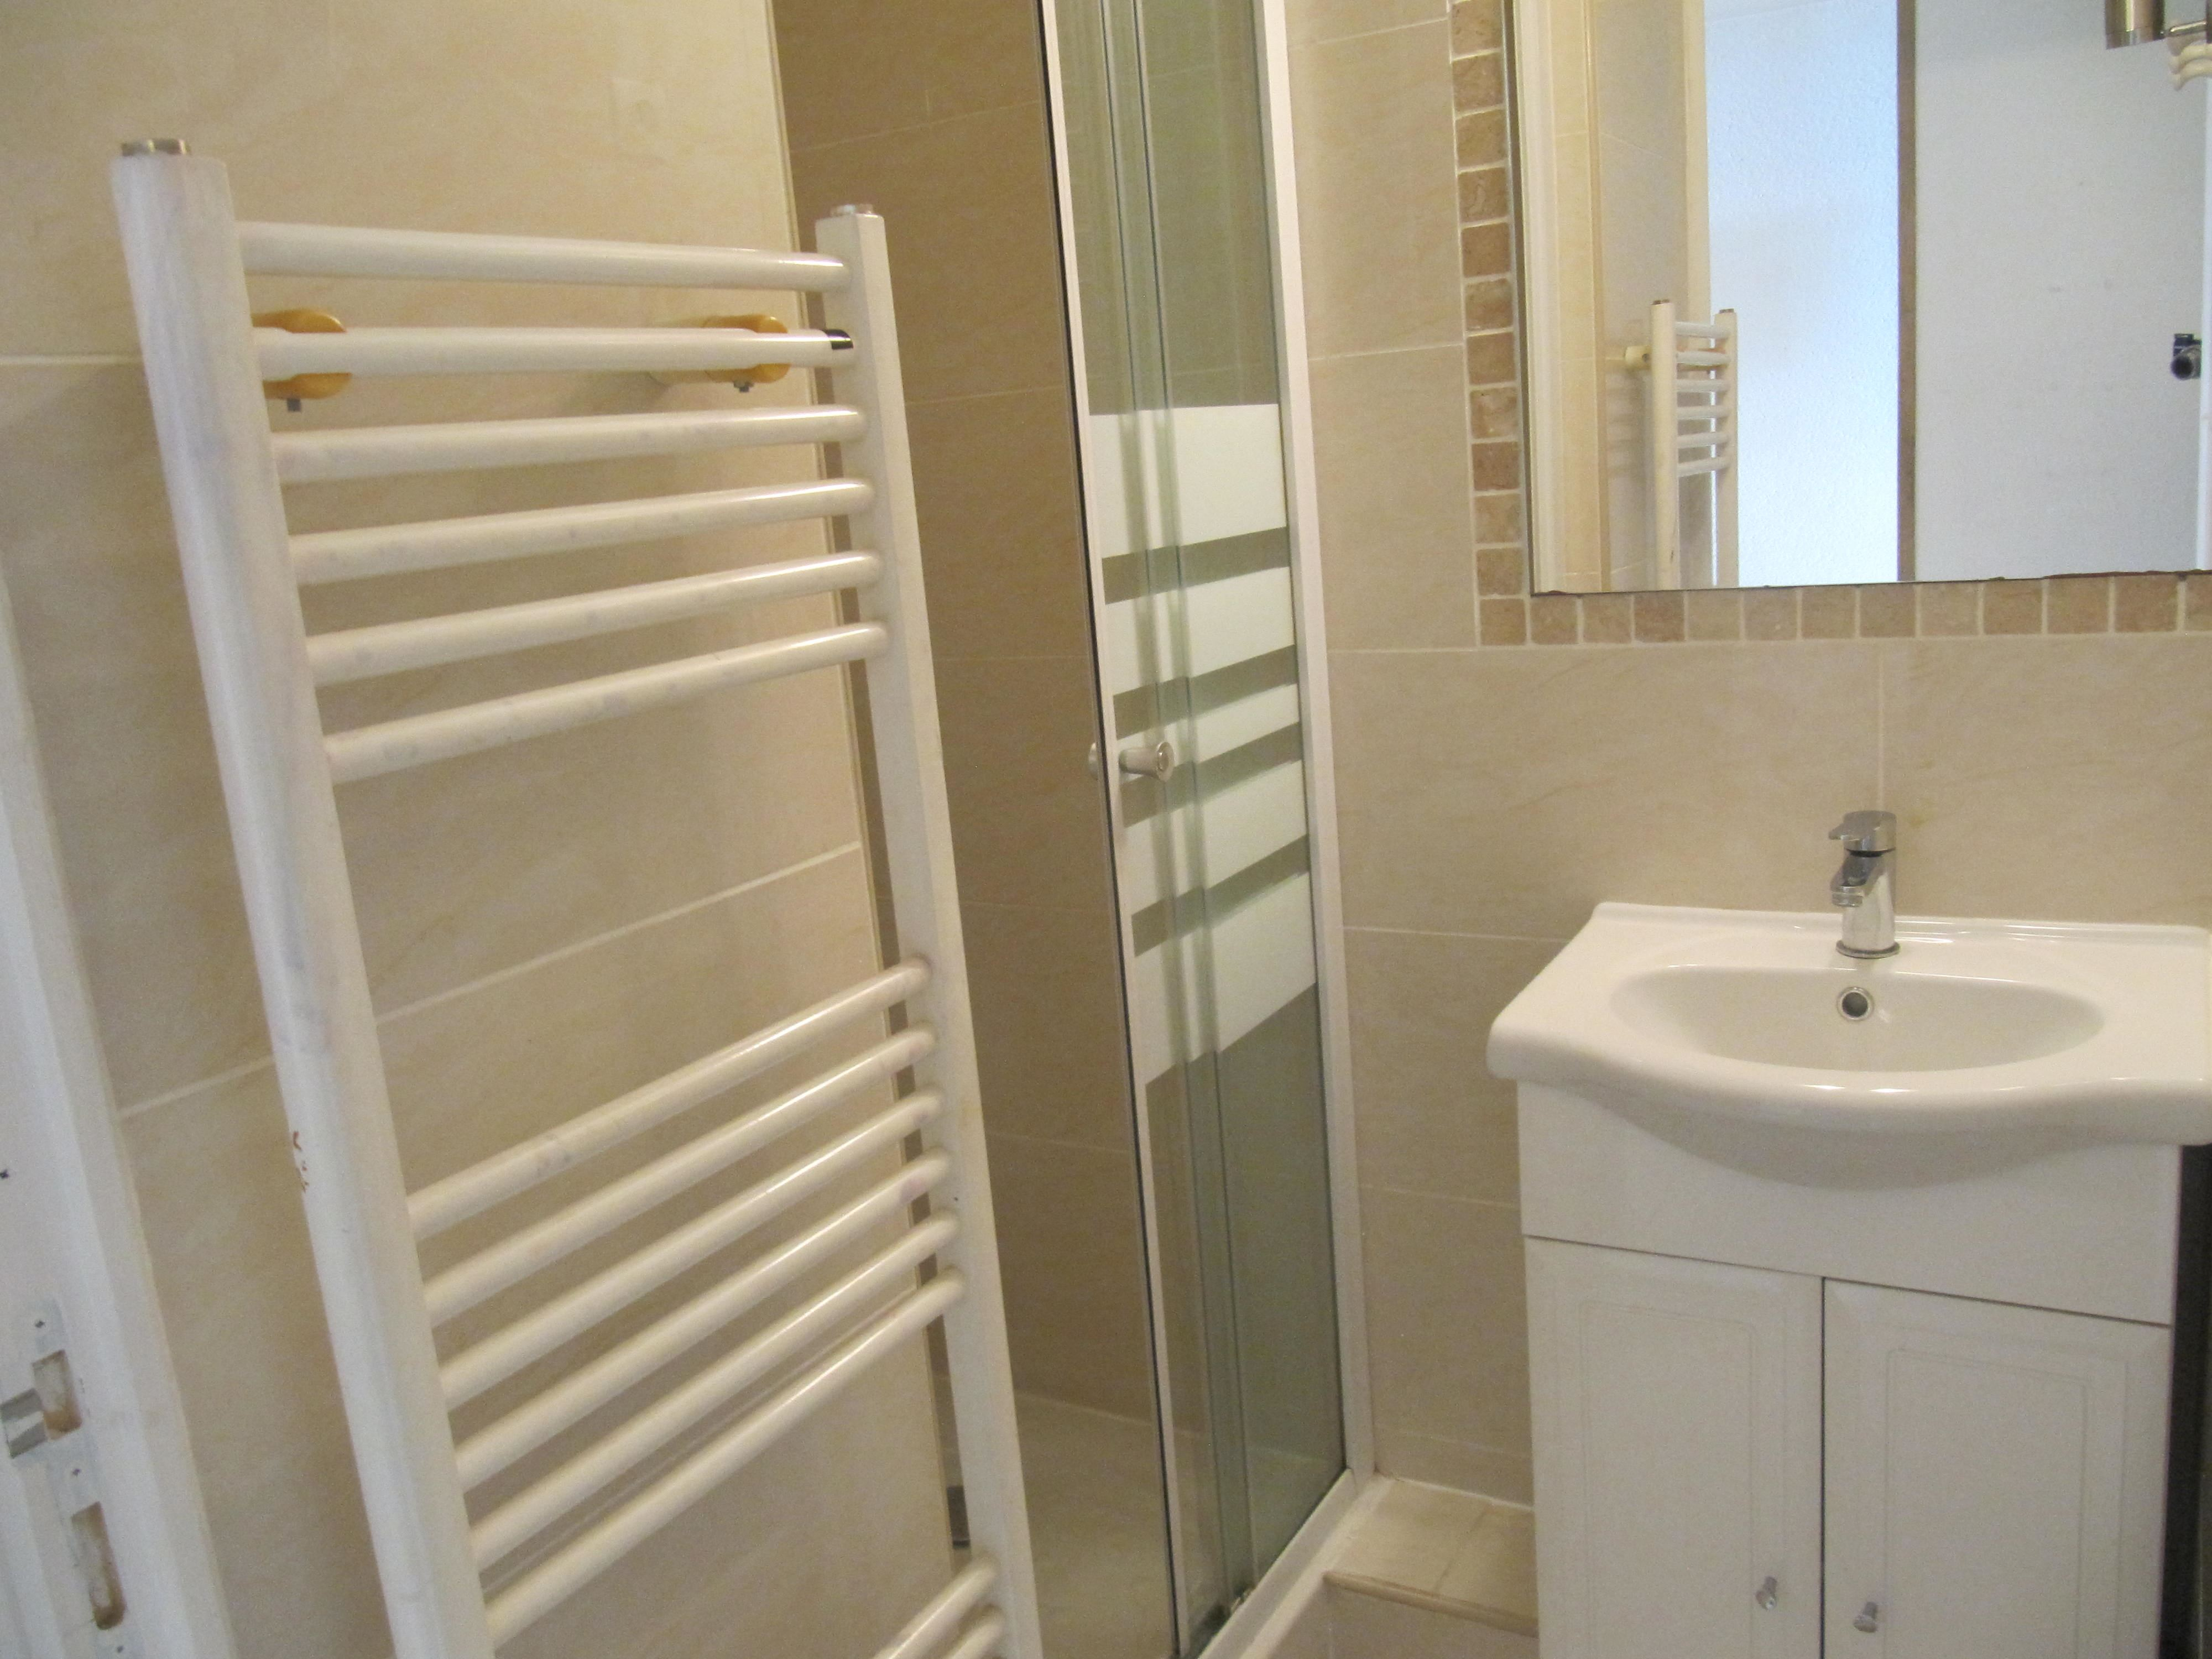 Cimes de Caron 2200 > 2 Rooms + Cabin - 4 persons - 2 Bronze Snowflakes (Ma Clé Immo)